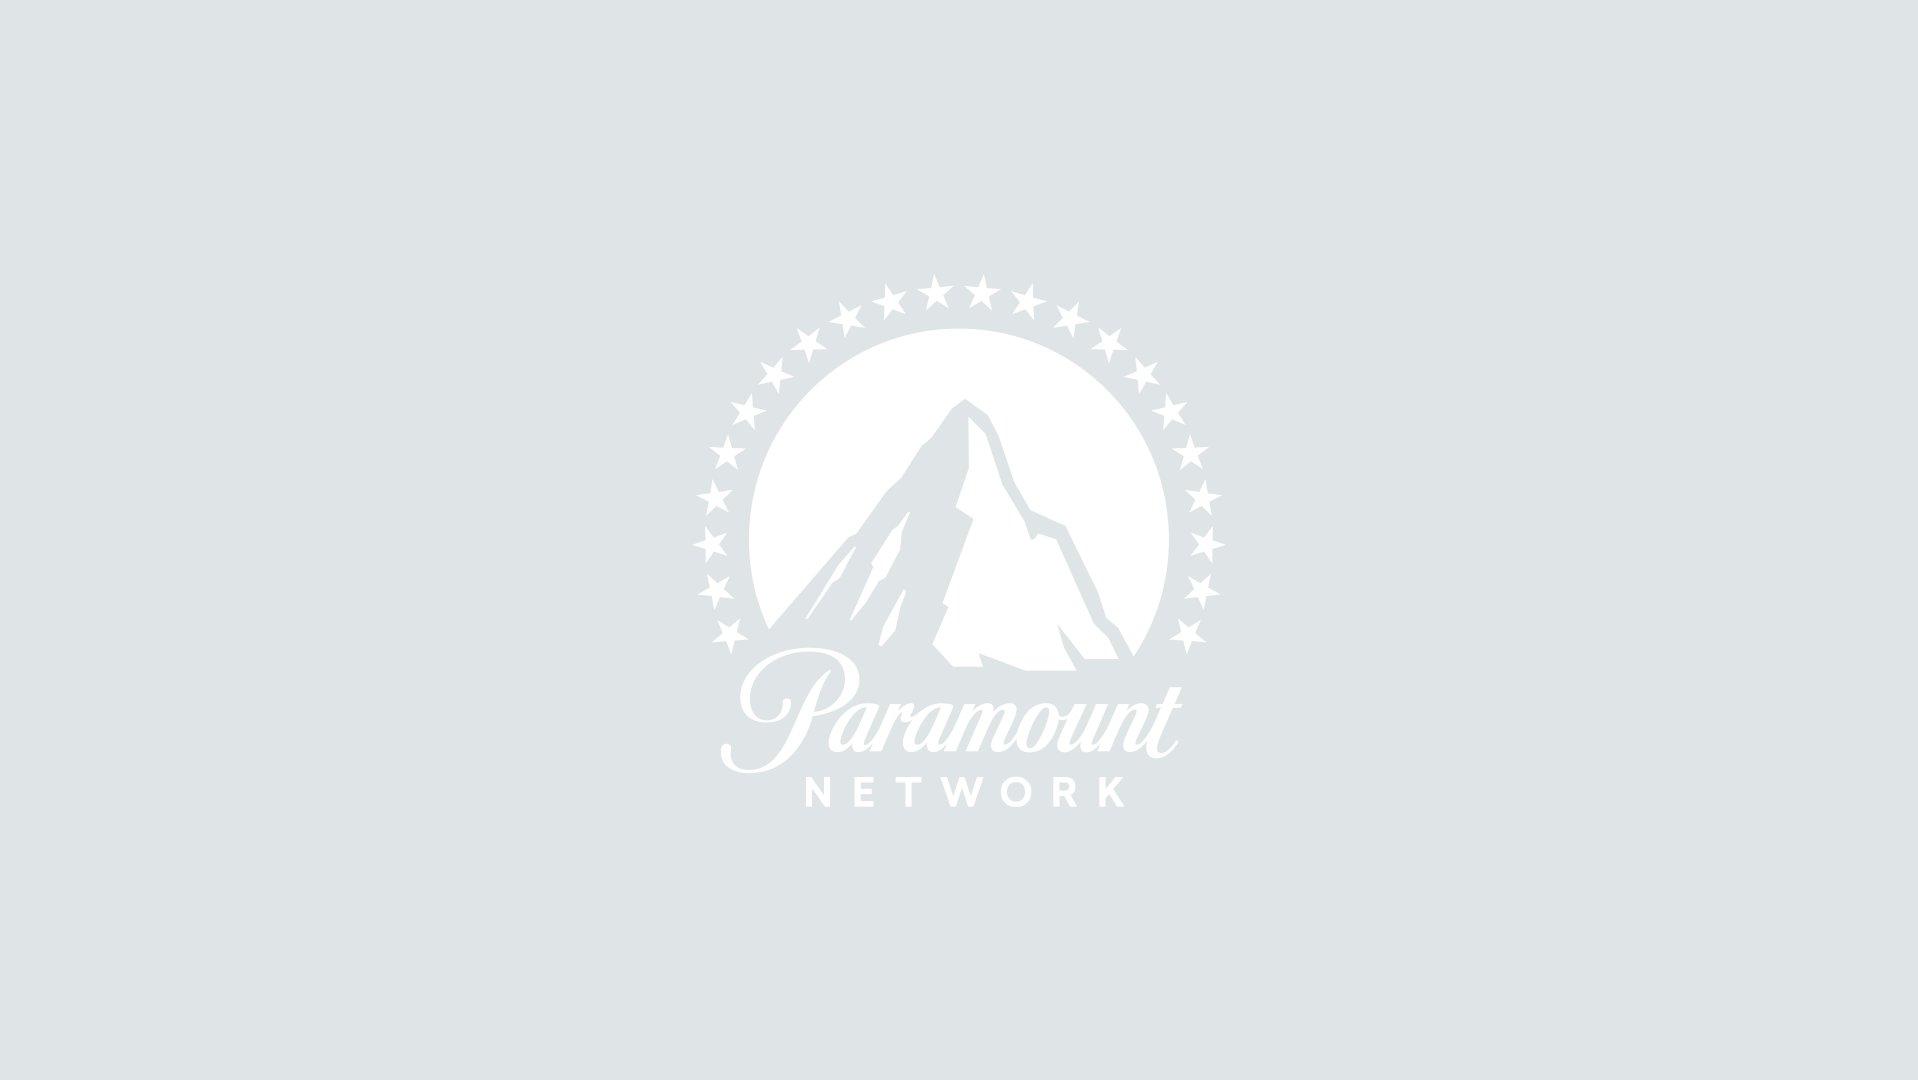 Monica e Chandler (Friends), foto: Getty Images